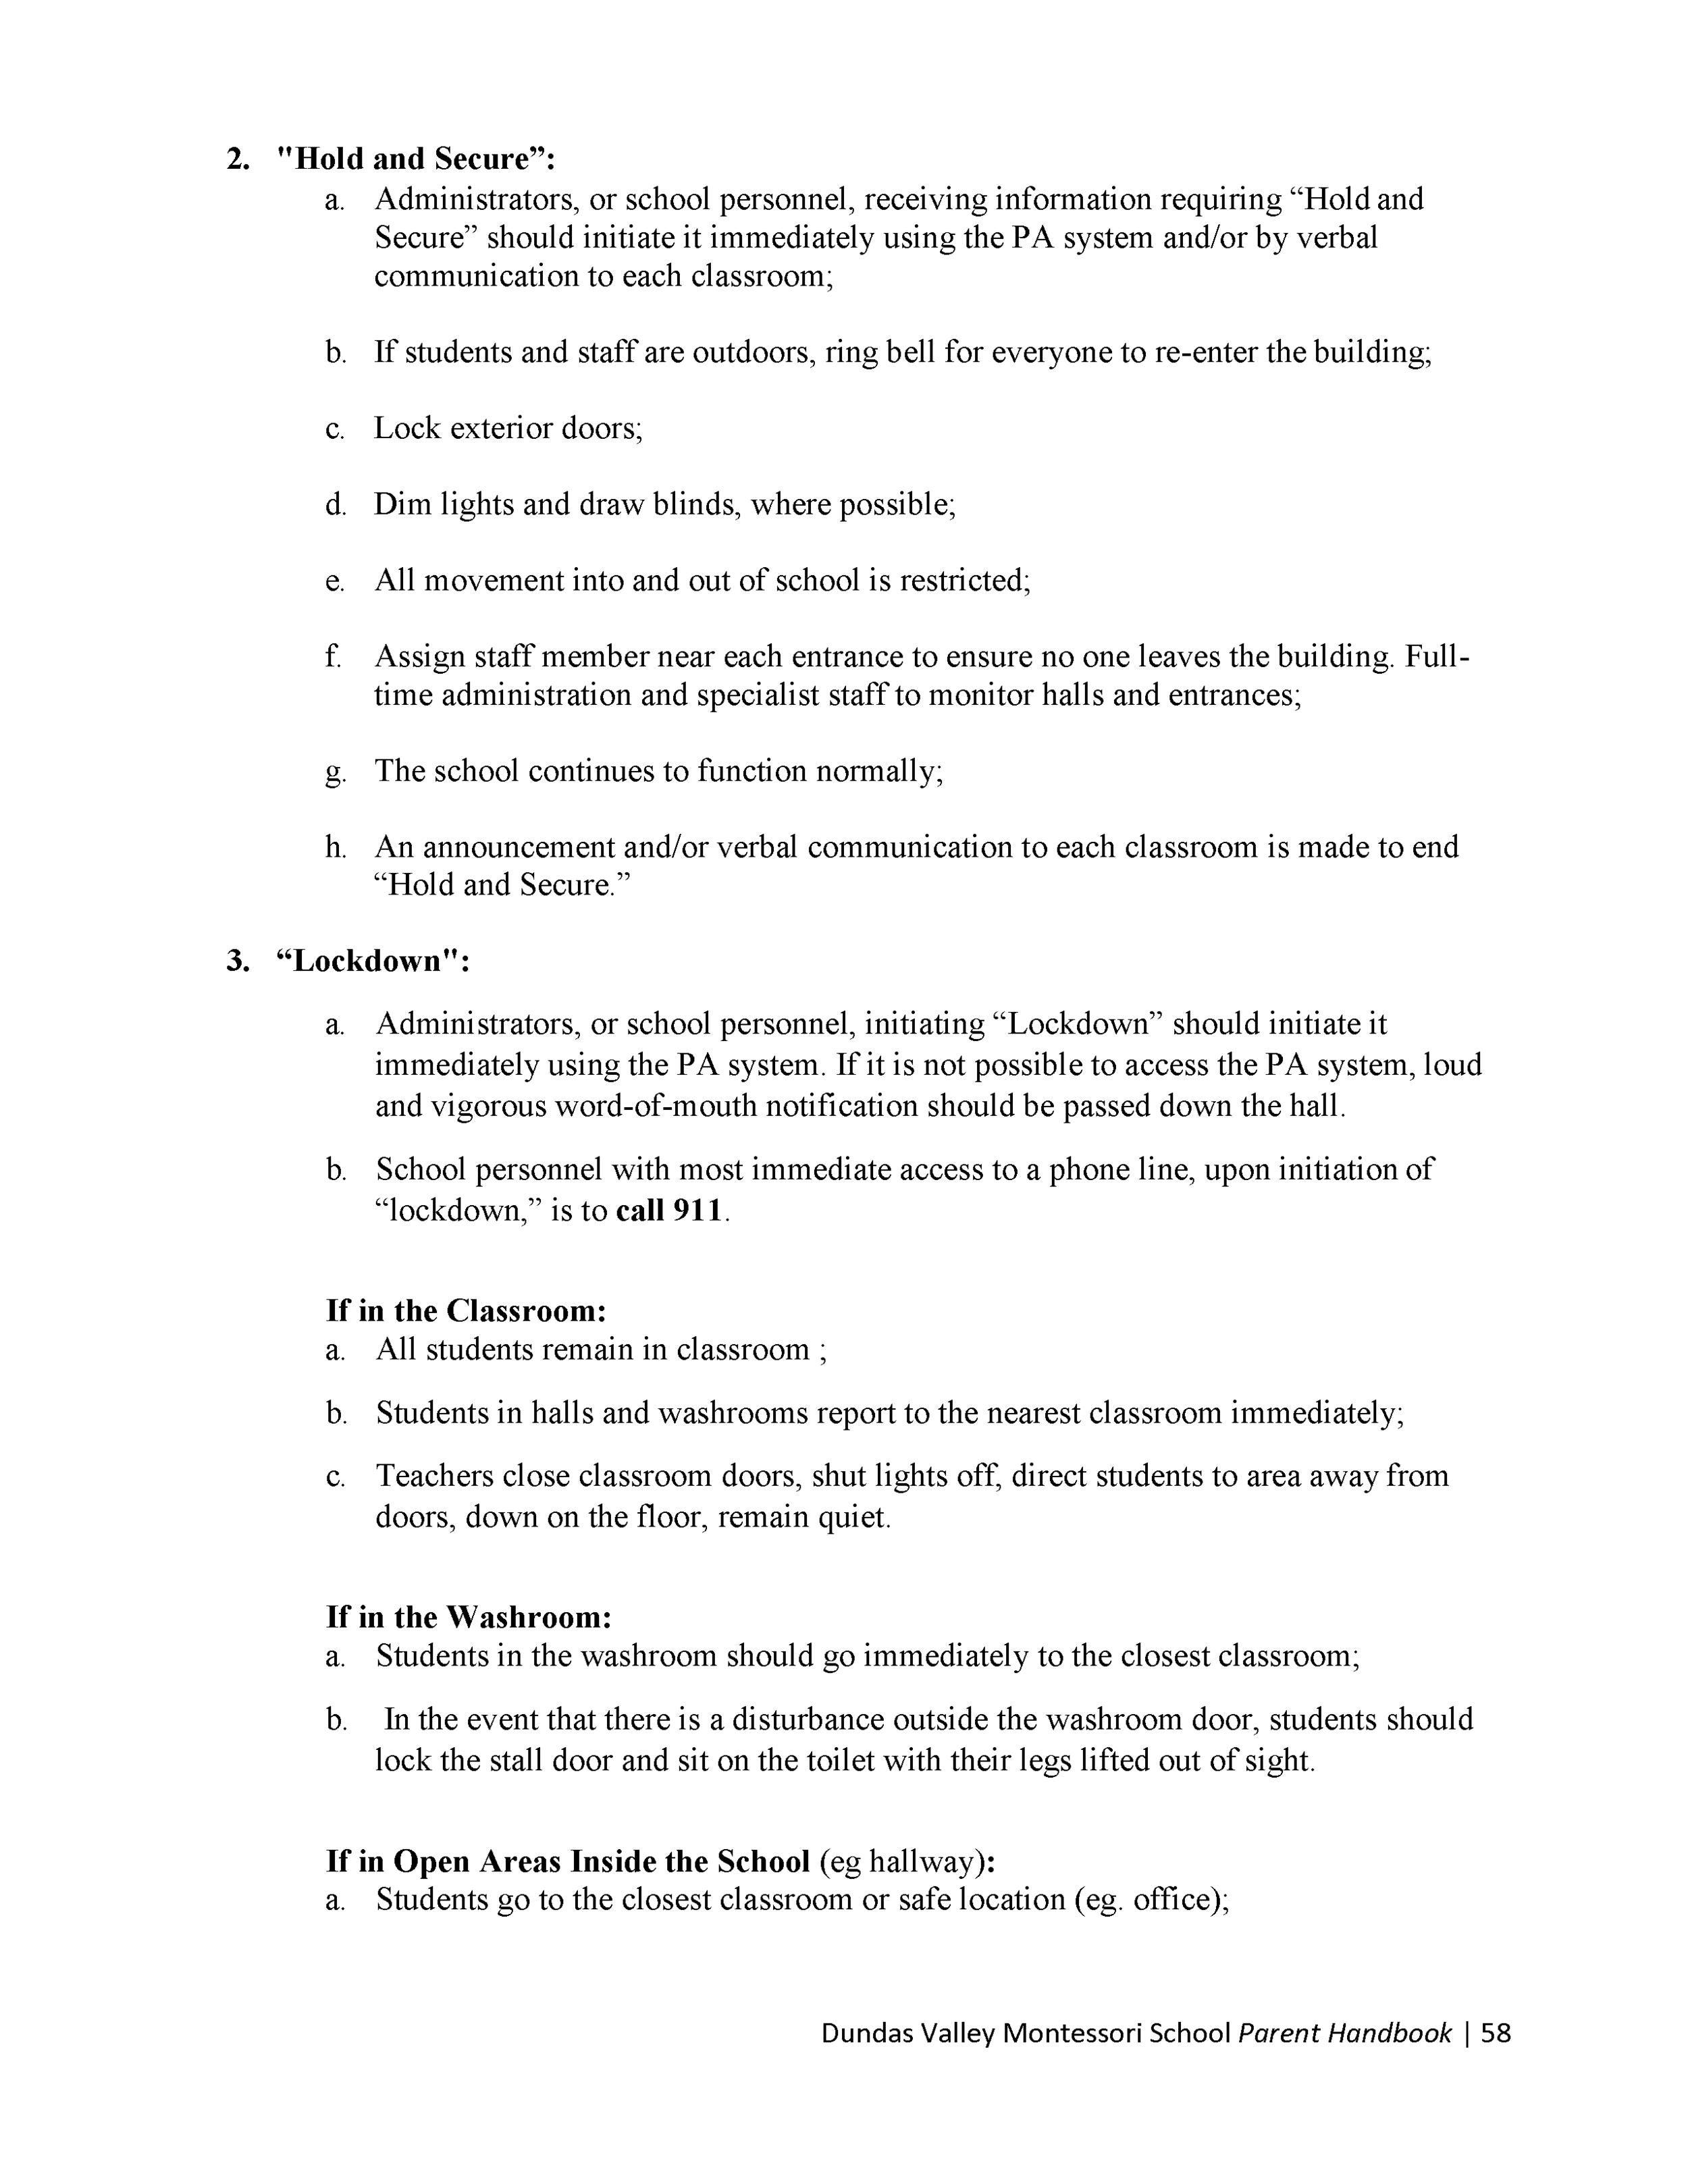 DVMS-Parent-Handbook-19-20_Page_060.png